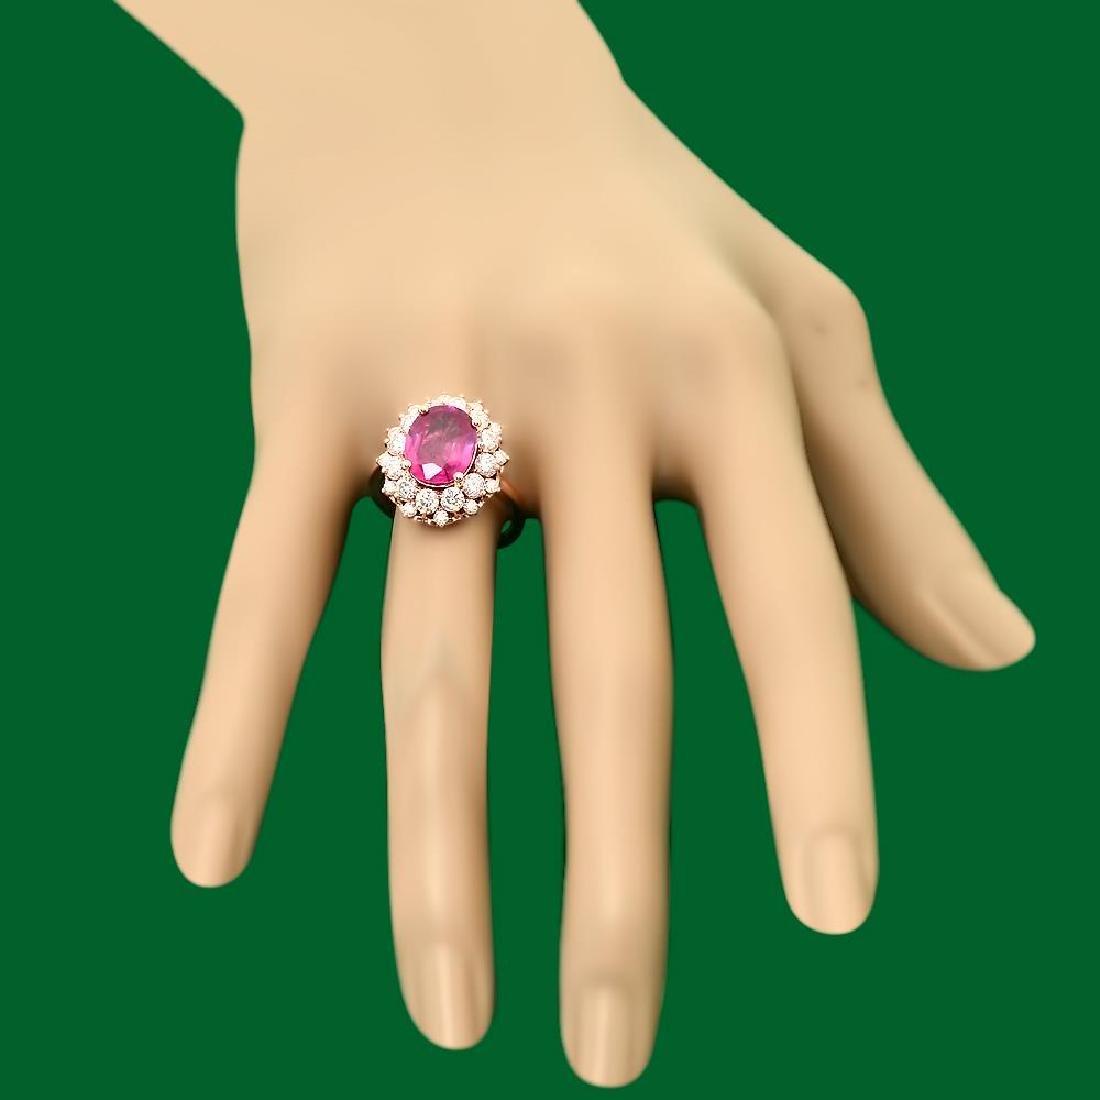 14k Gold 4.05ct Ruby 1.60ct Diamond Ring - 3